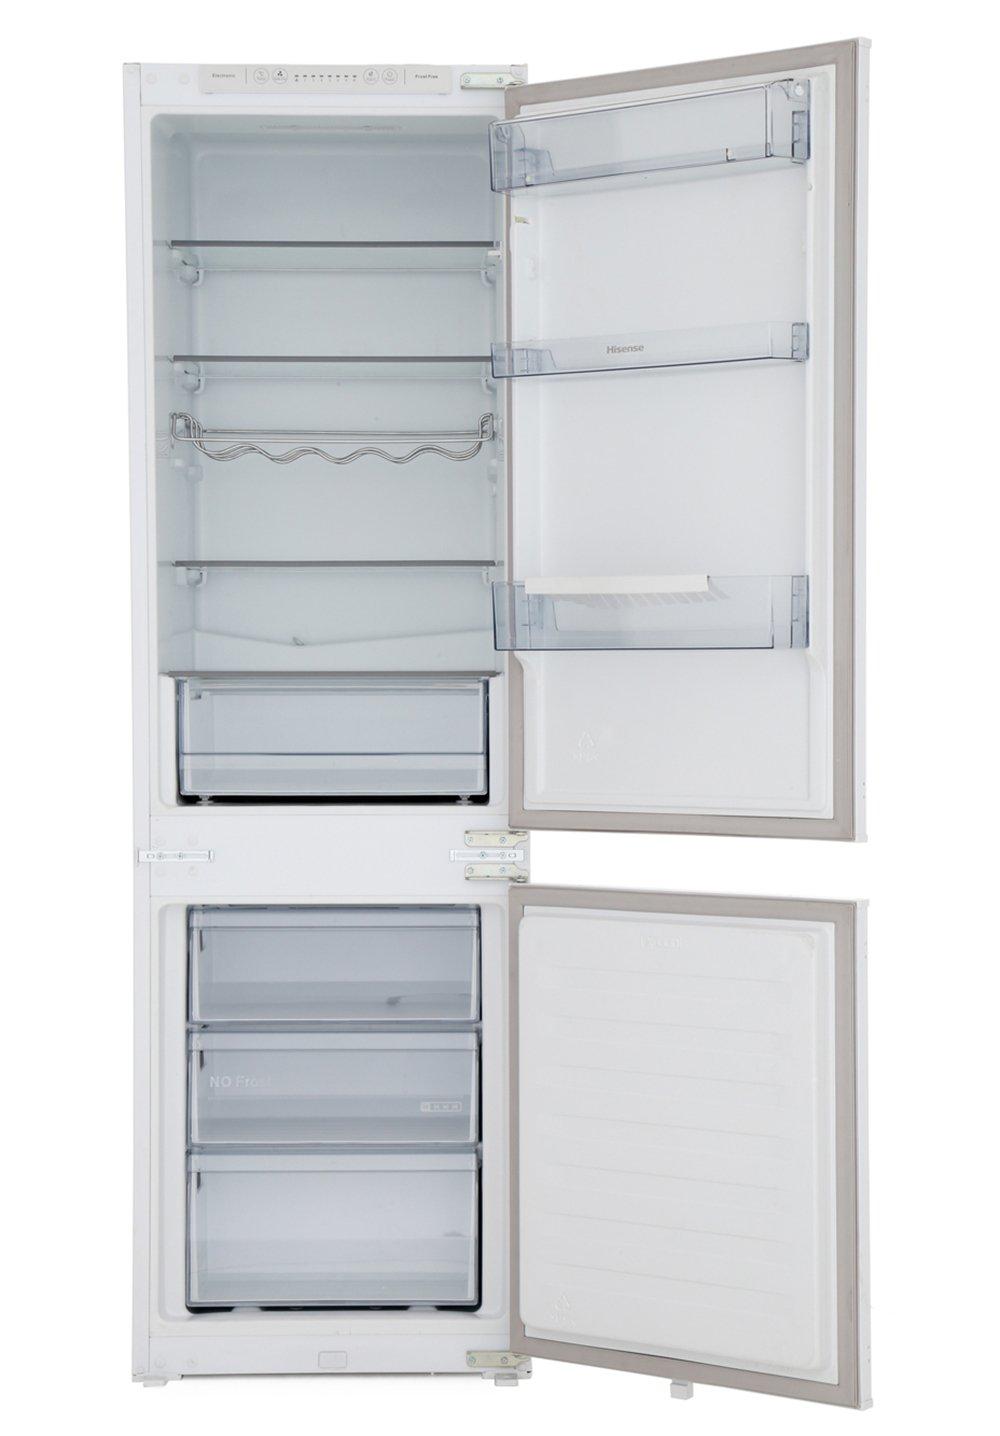 Hisense RIB312F4AW1 Frost Free Integrated Fridge Freezer